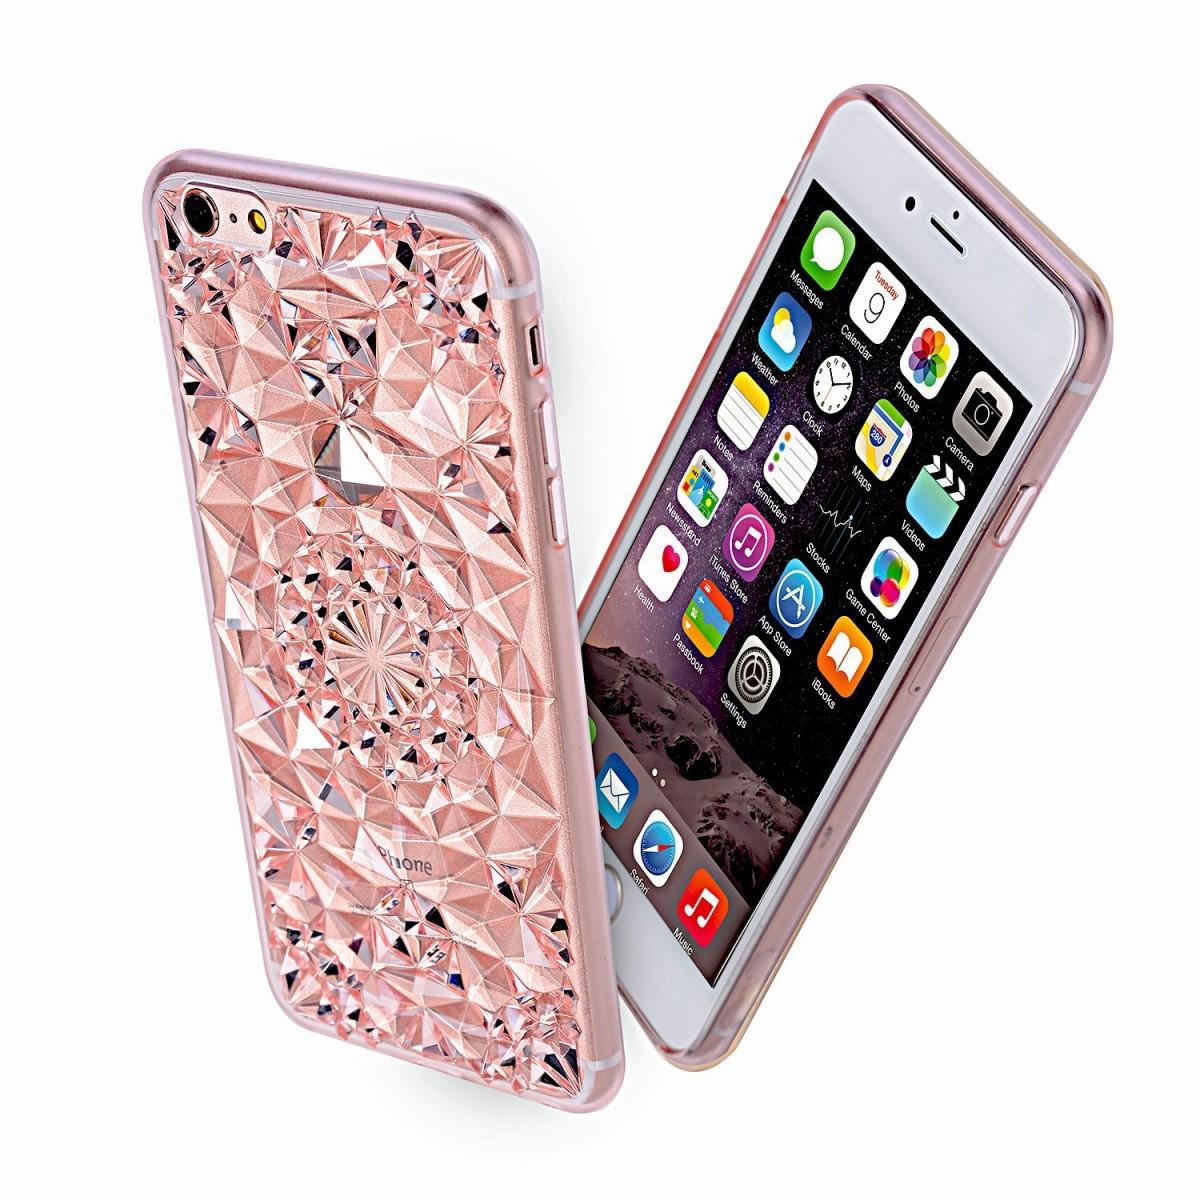 Kryt 3D Flowers & Crystals pro iPhone SE / 5s / 5 - Růžový